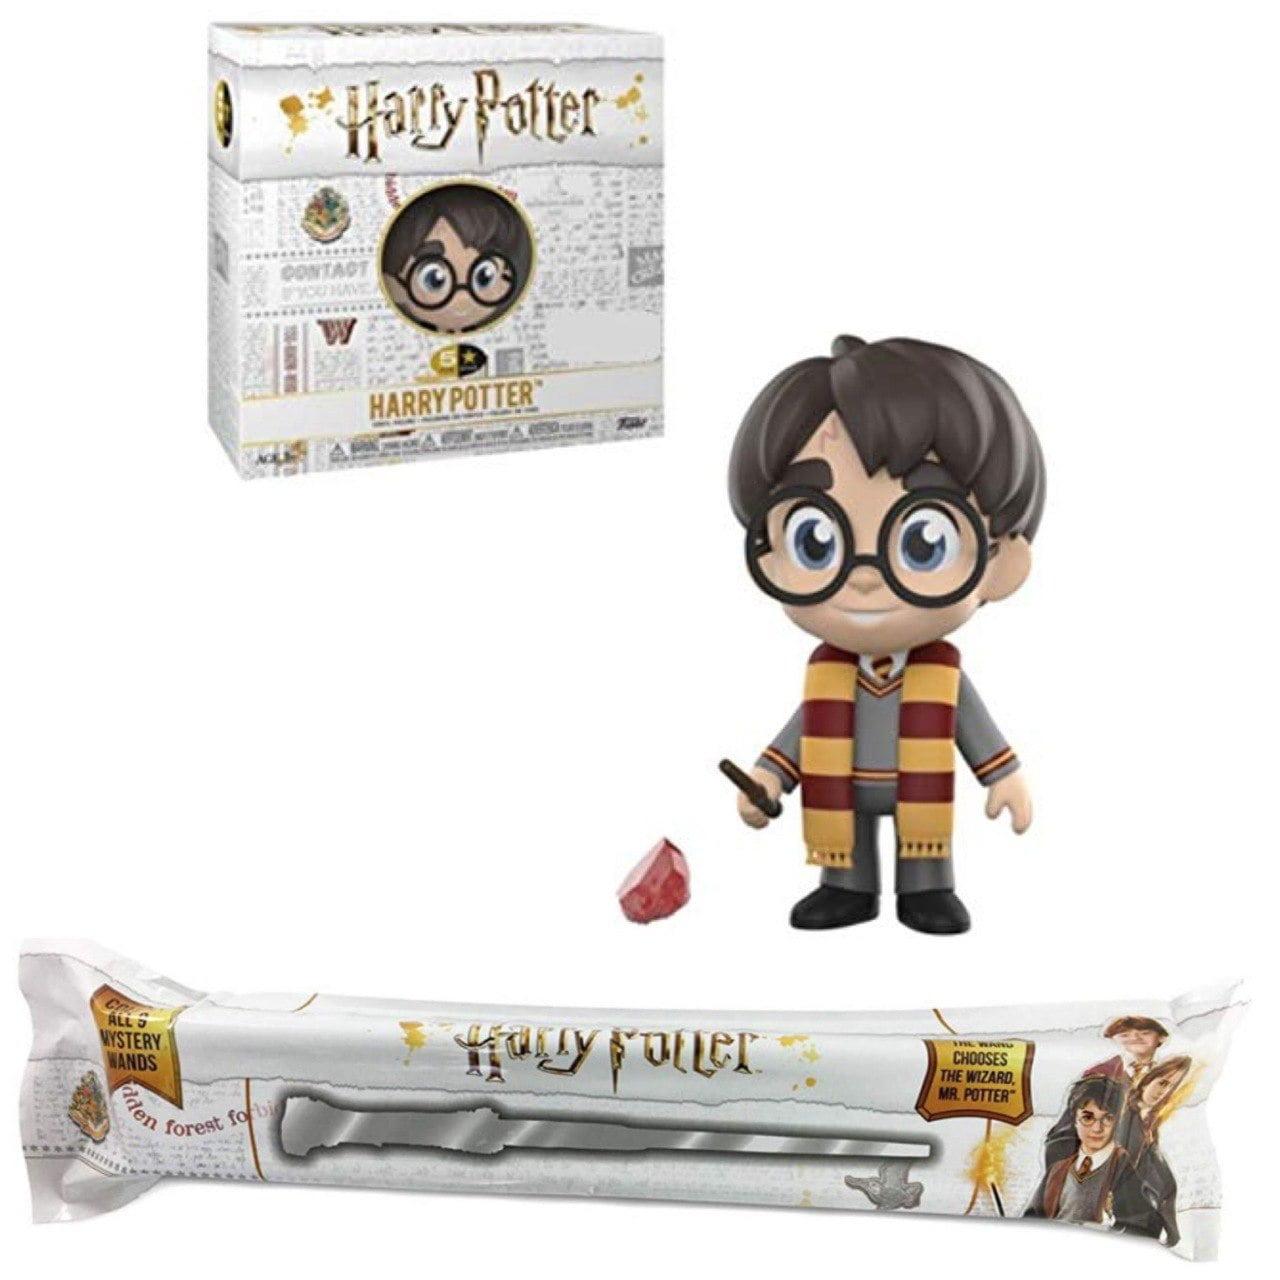 Harry Potter Mystery Wand 12 inch Wand